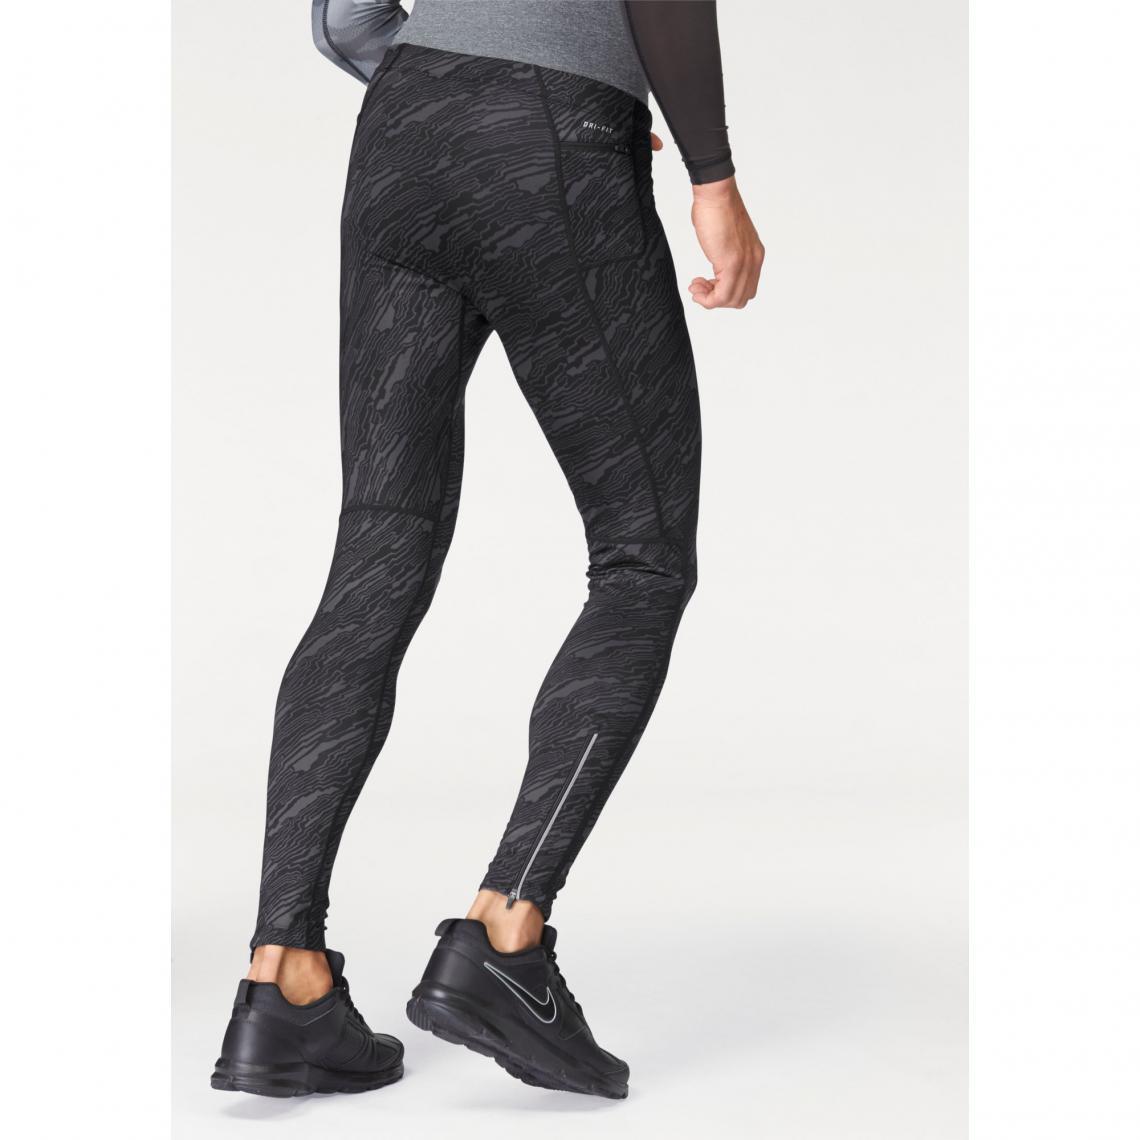 Collant de running homme Dri-FIT Tech Elevated Tight Nike - Noir  418bd3b530c